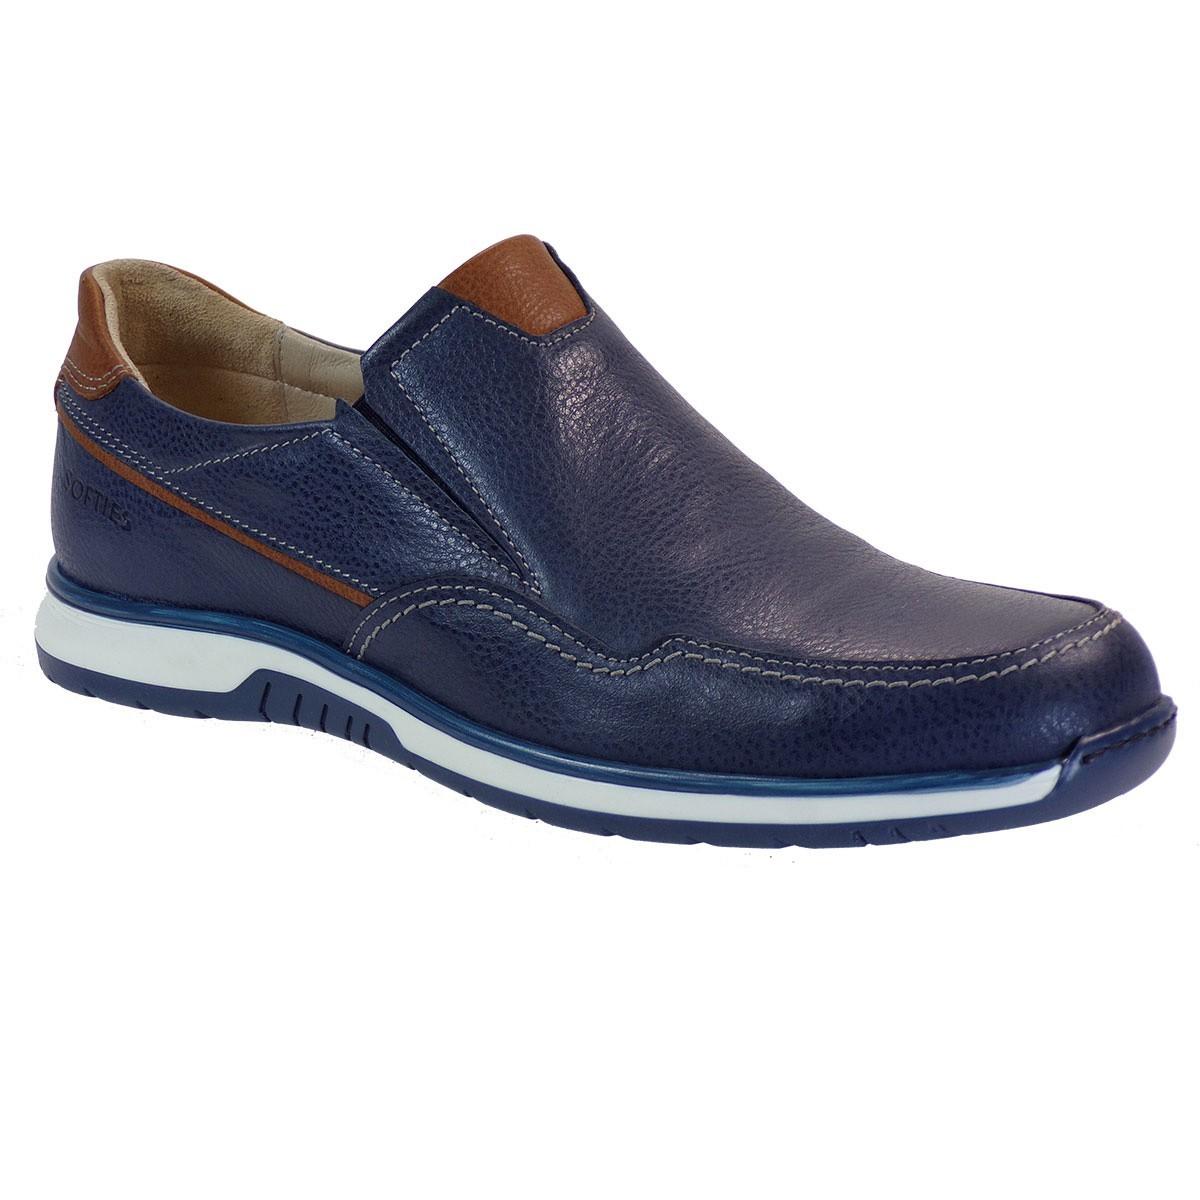 Softies Ανδρικά Παπούτσια 6111 Μπλέ Δέρμα